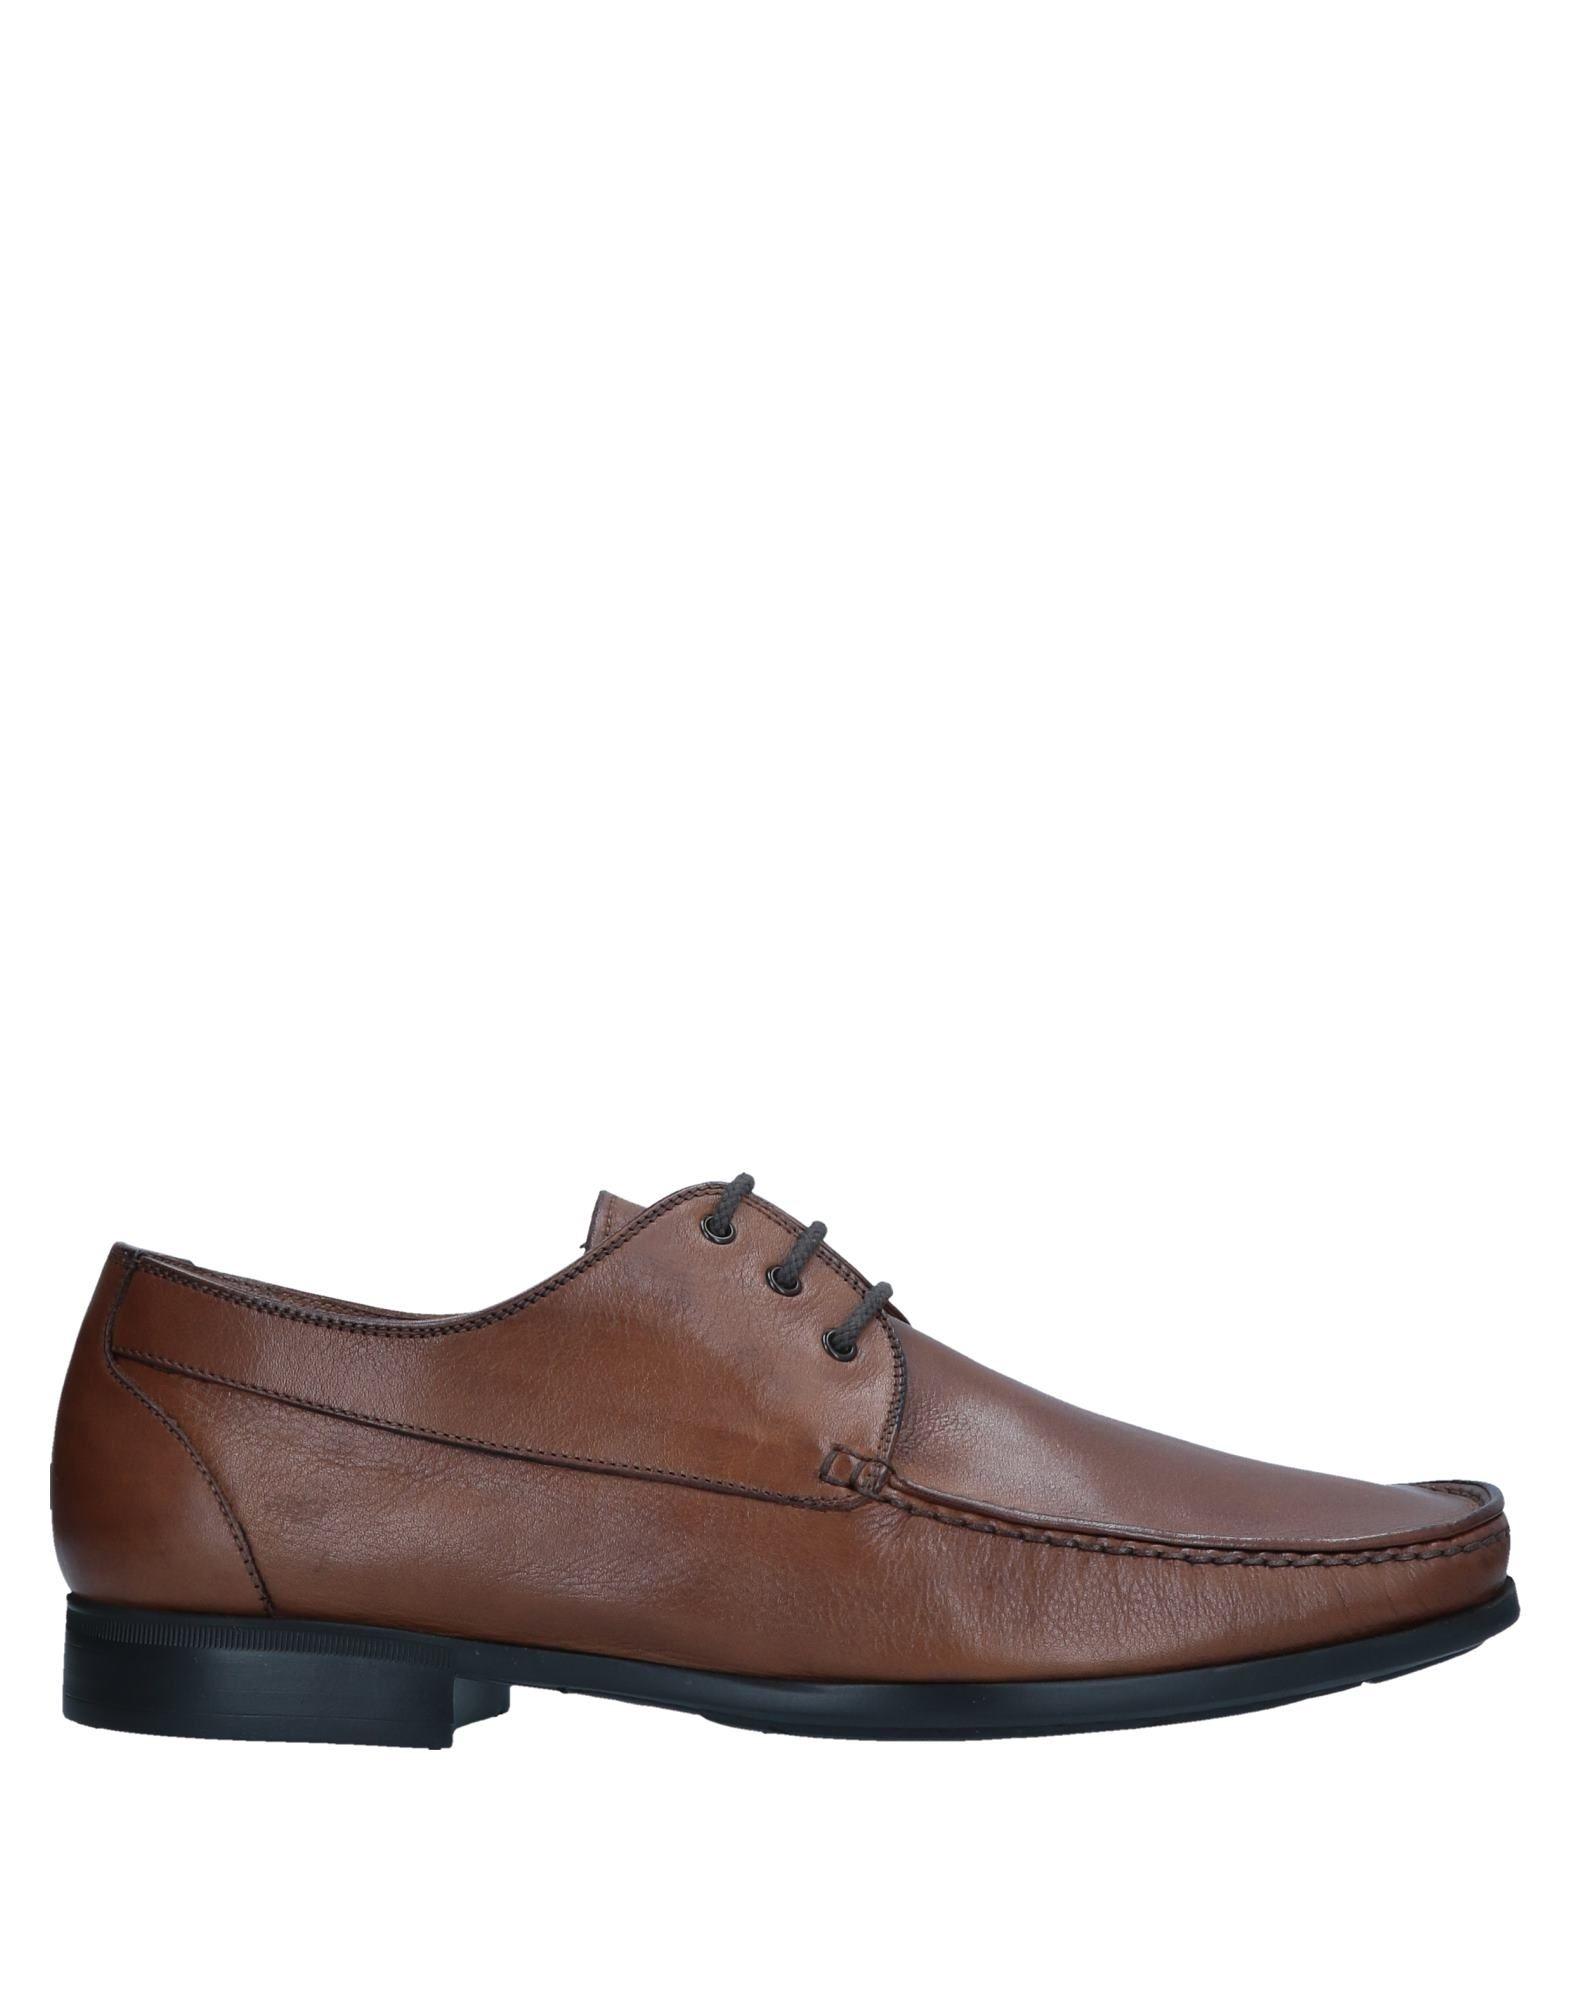 TODAY by CALPIERRE Обувь на шнурках calpierre обувь на шнурках